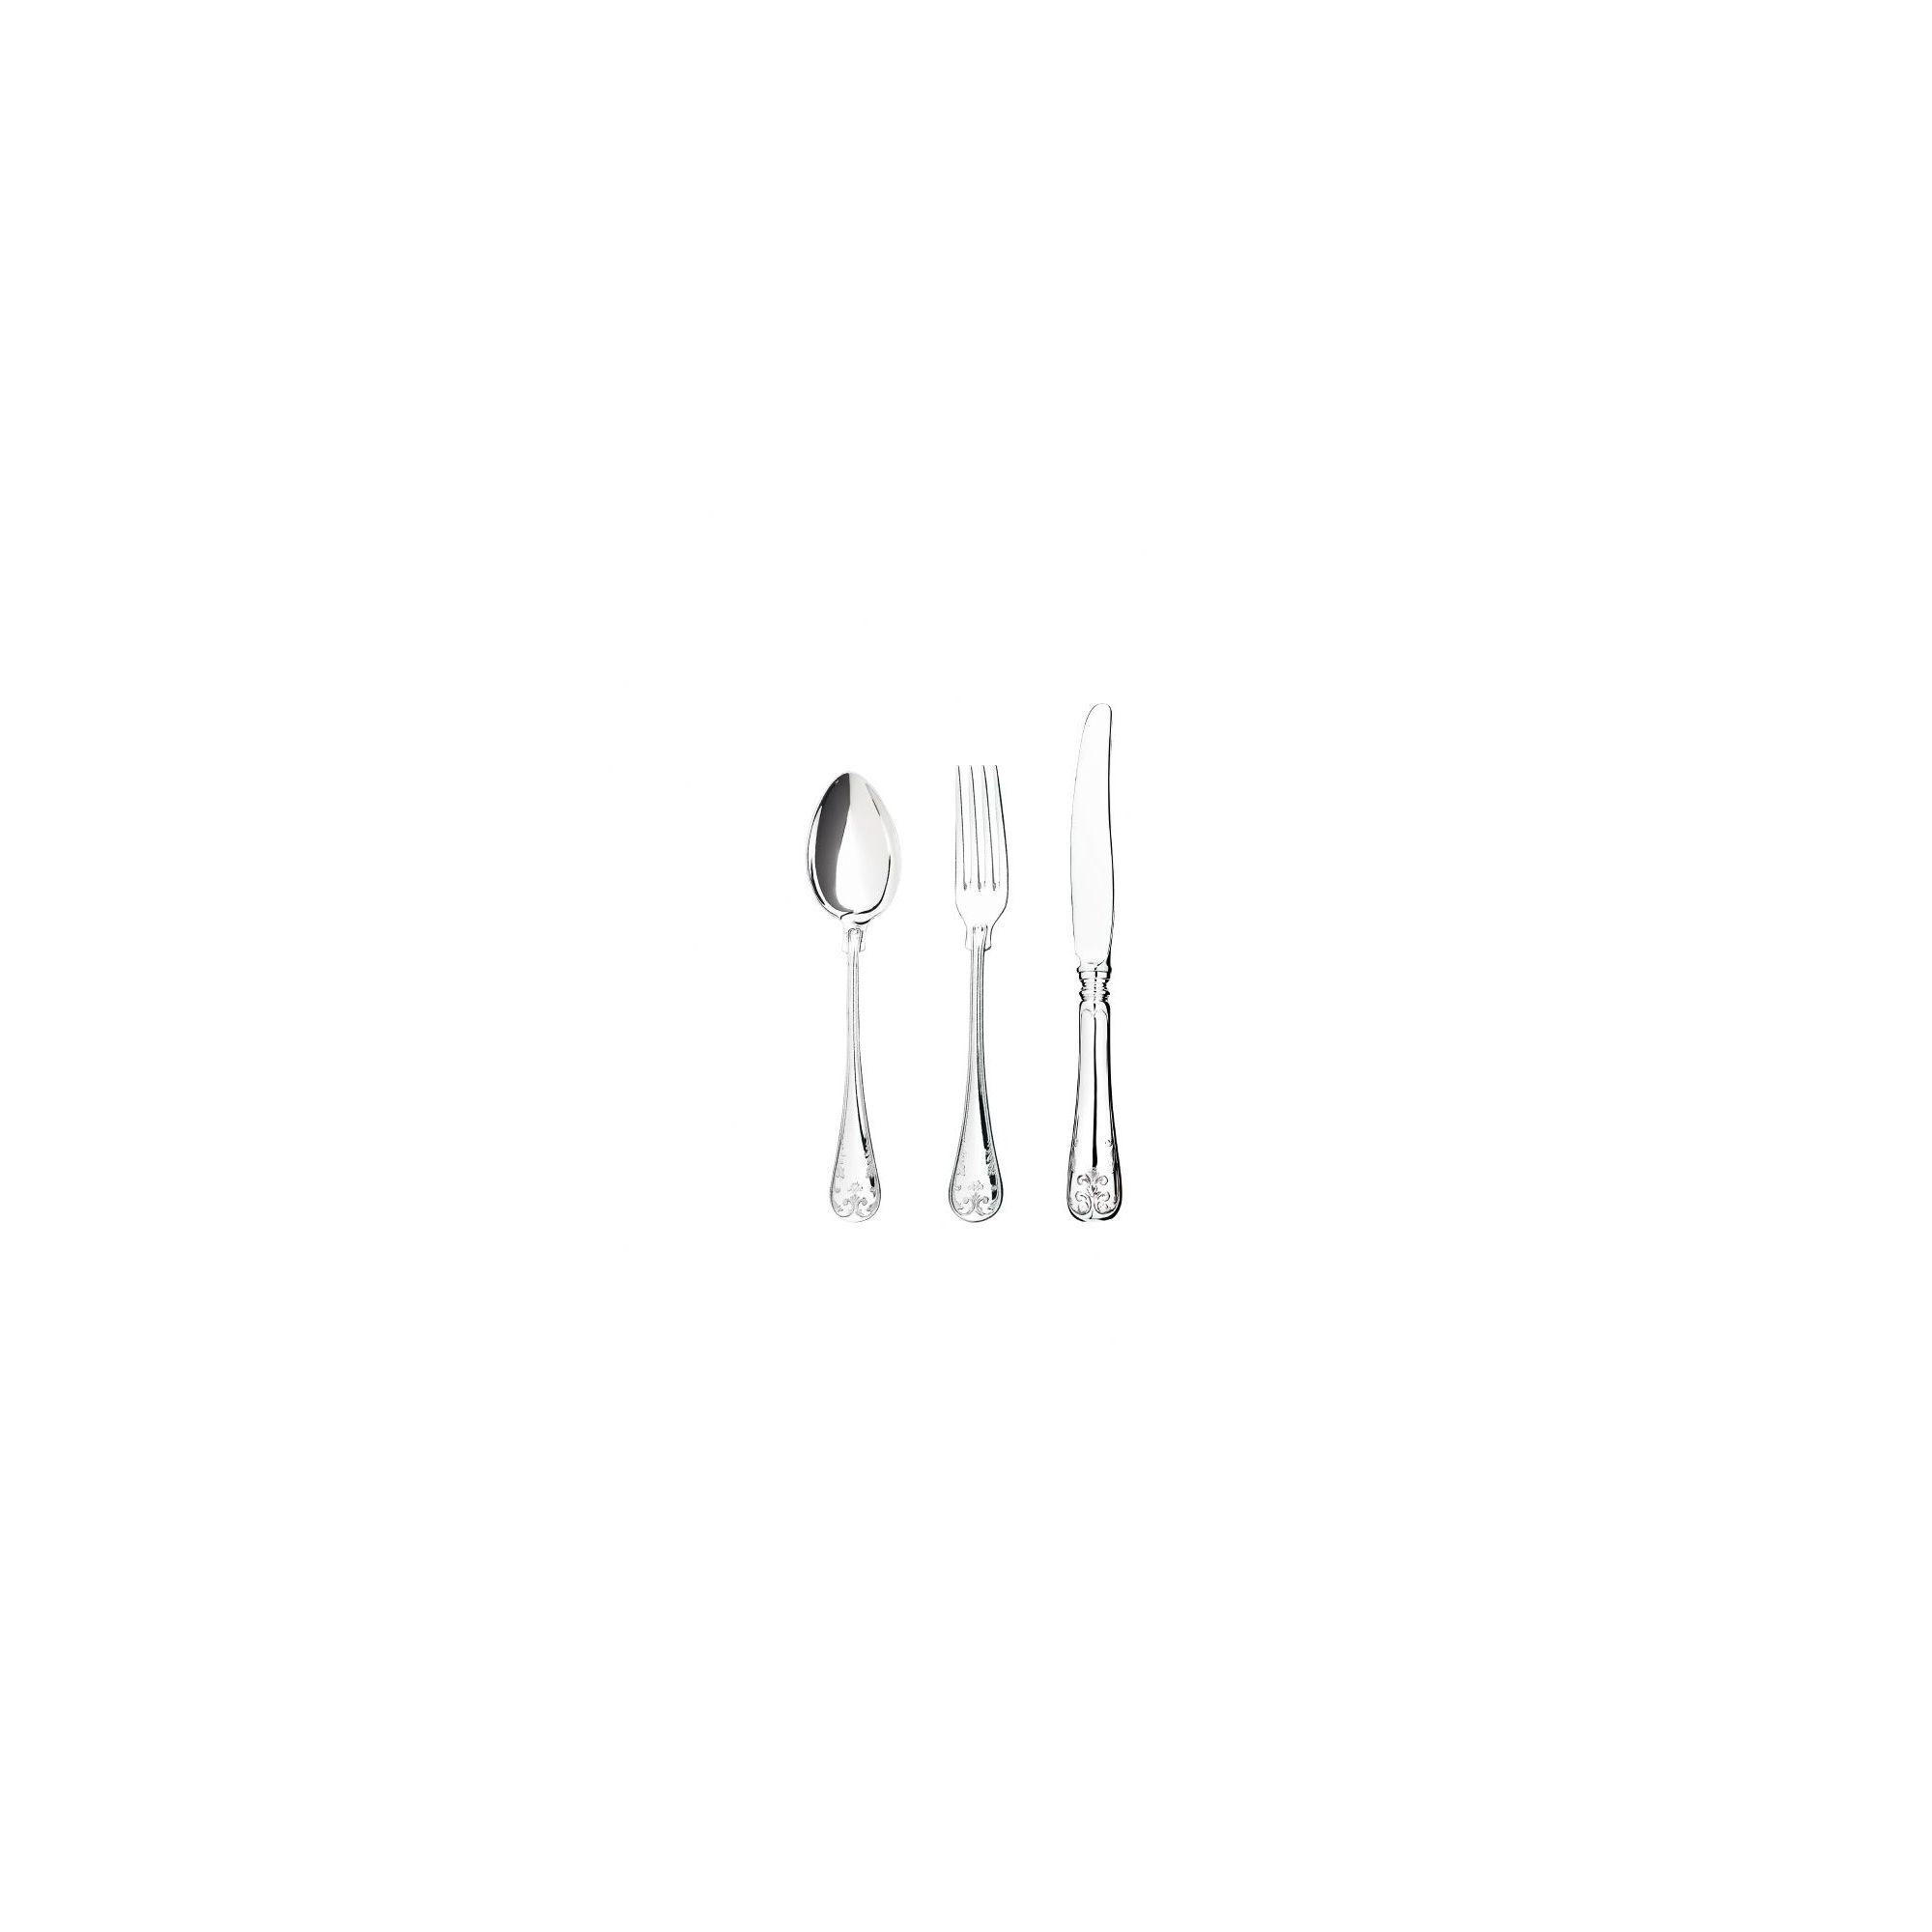 Mema/GAB Gammal Fransk 12 Piece Silver Plated Cutlery Set 1 at Tesco Direct